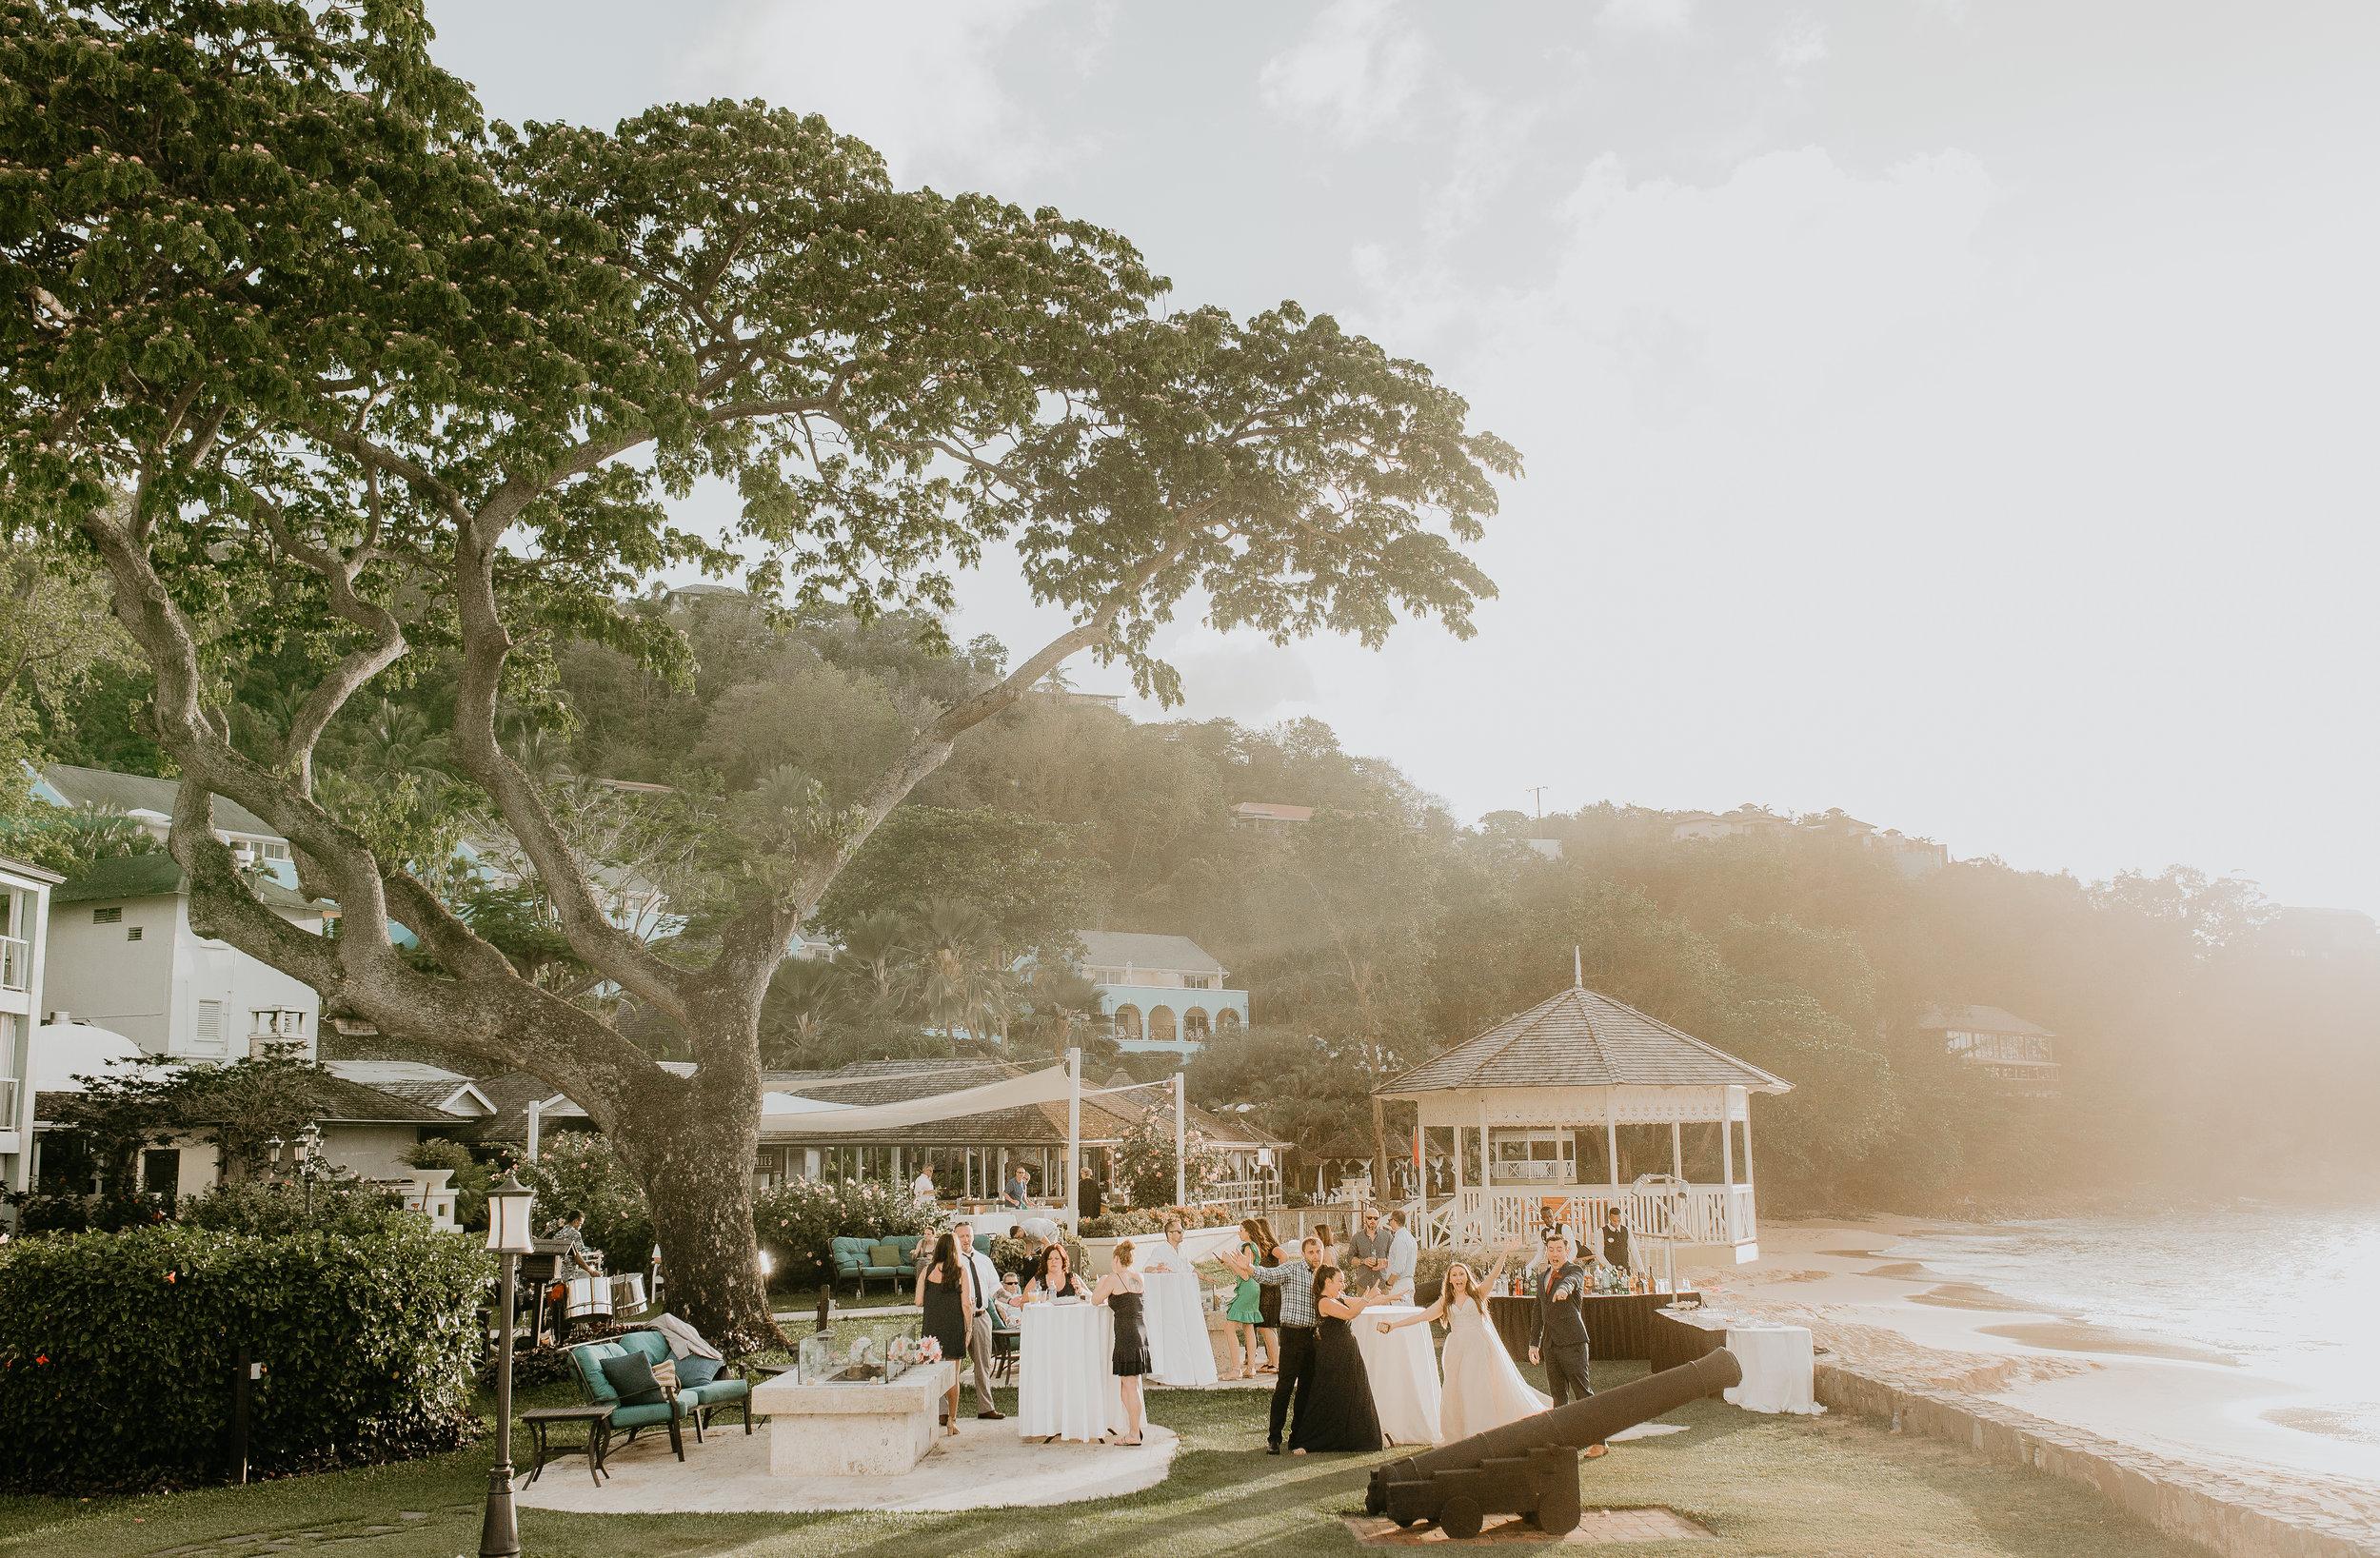 nicole-daacke-photography-destination-wedding-in-st-lucia-sandals-la-toc-intimate-island-wedding-carribean-elopement-photographer-chill-island-wedding-110.jpg